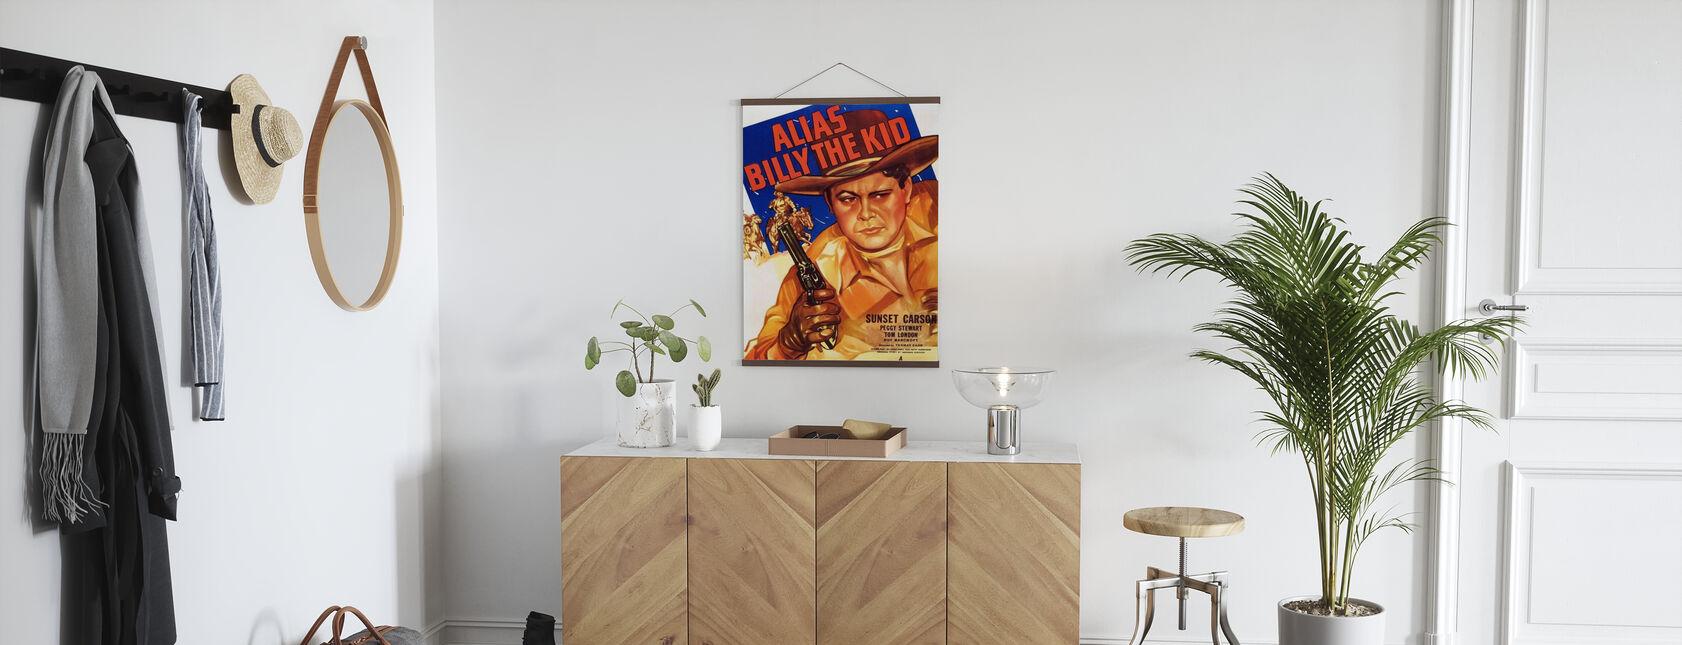 Poster del film Alias Billy the Kid - Poster - Sala